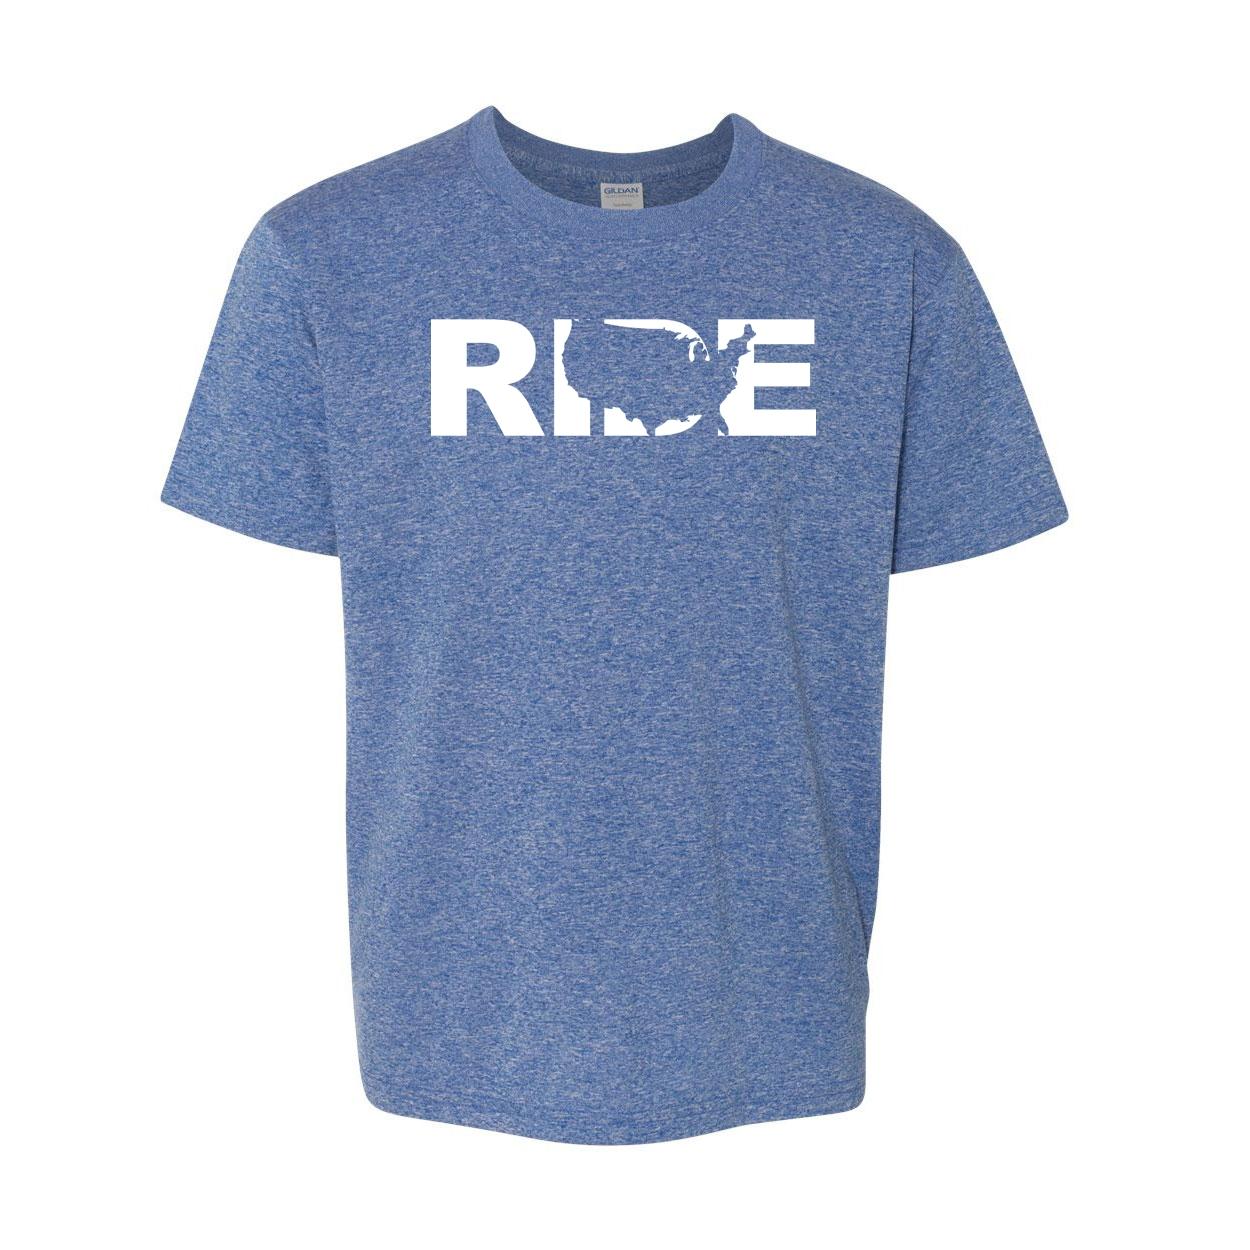 Ride United States Classic Youth T-Shirt Blue (White Logo)